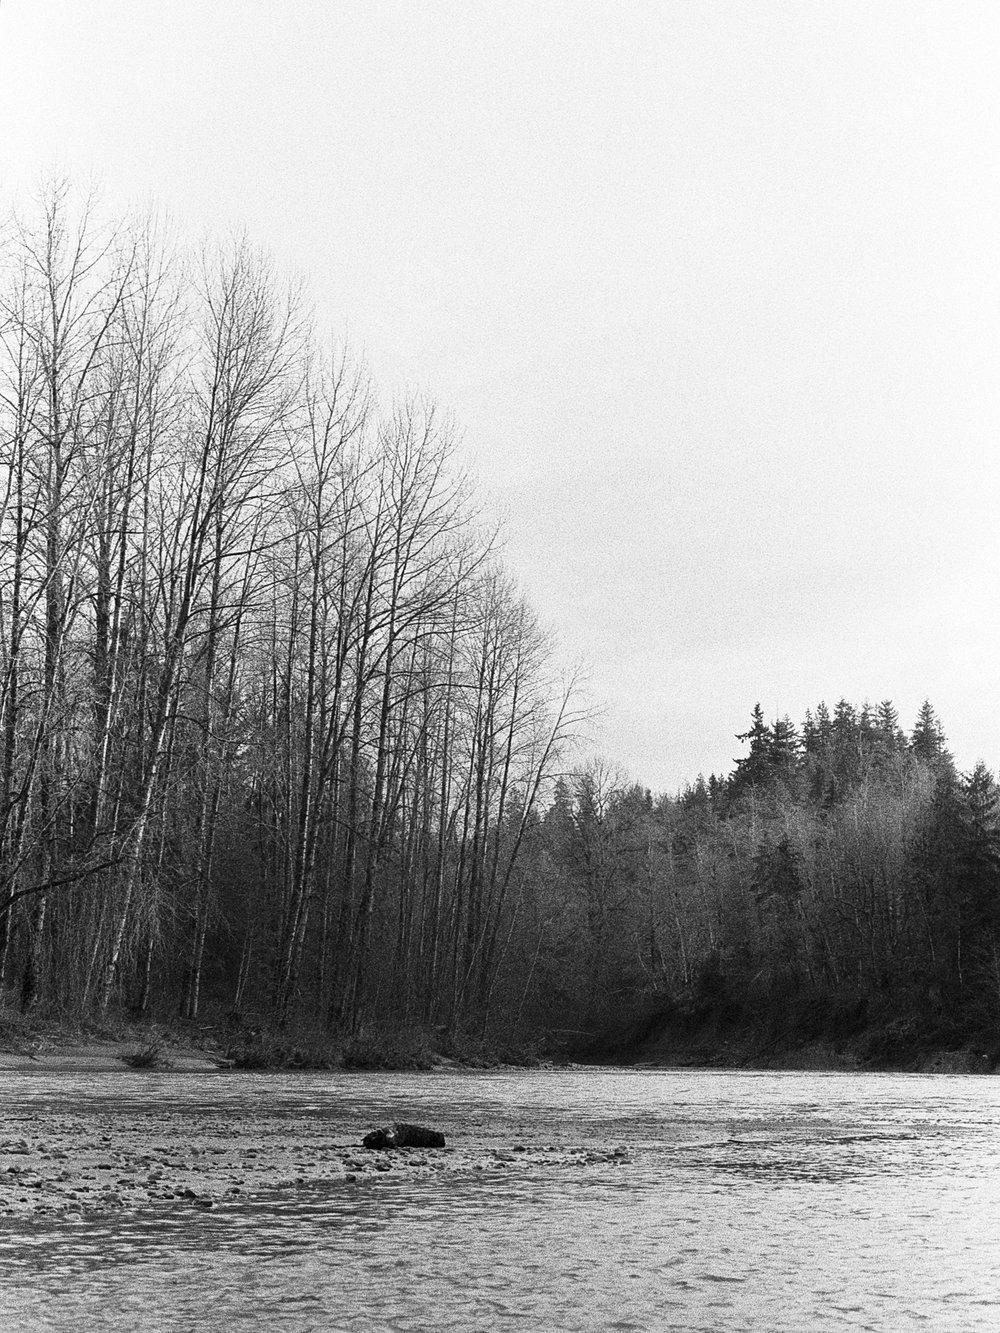 Stillaguamish River | Minolta XD5 + Minolta 50/1.4 - Ilford HP5+